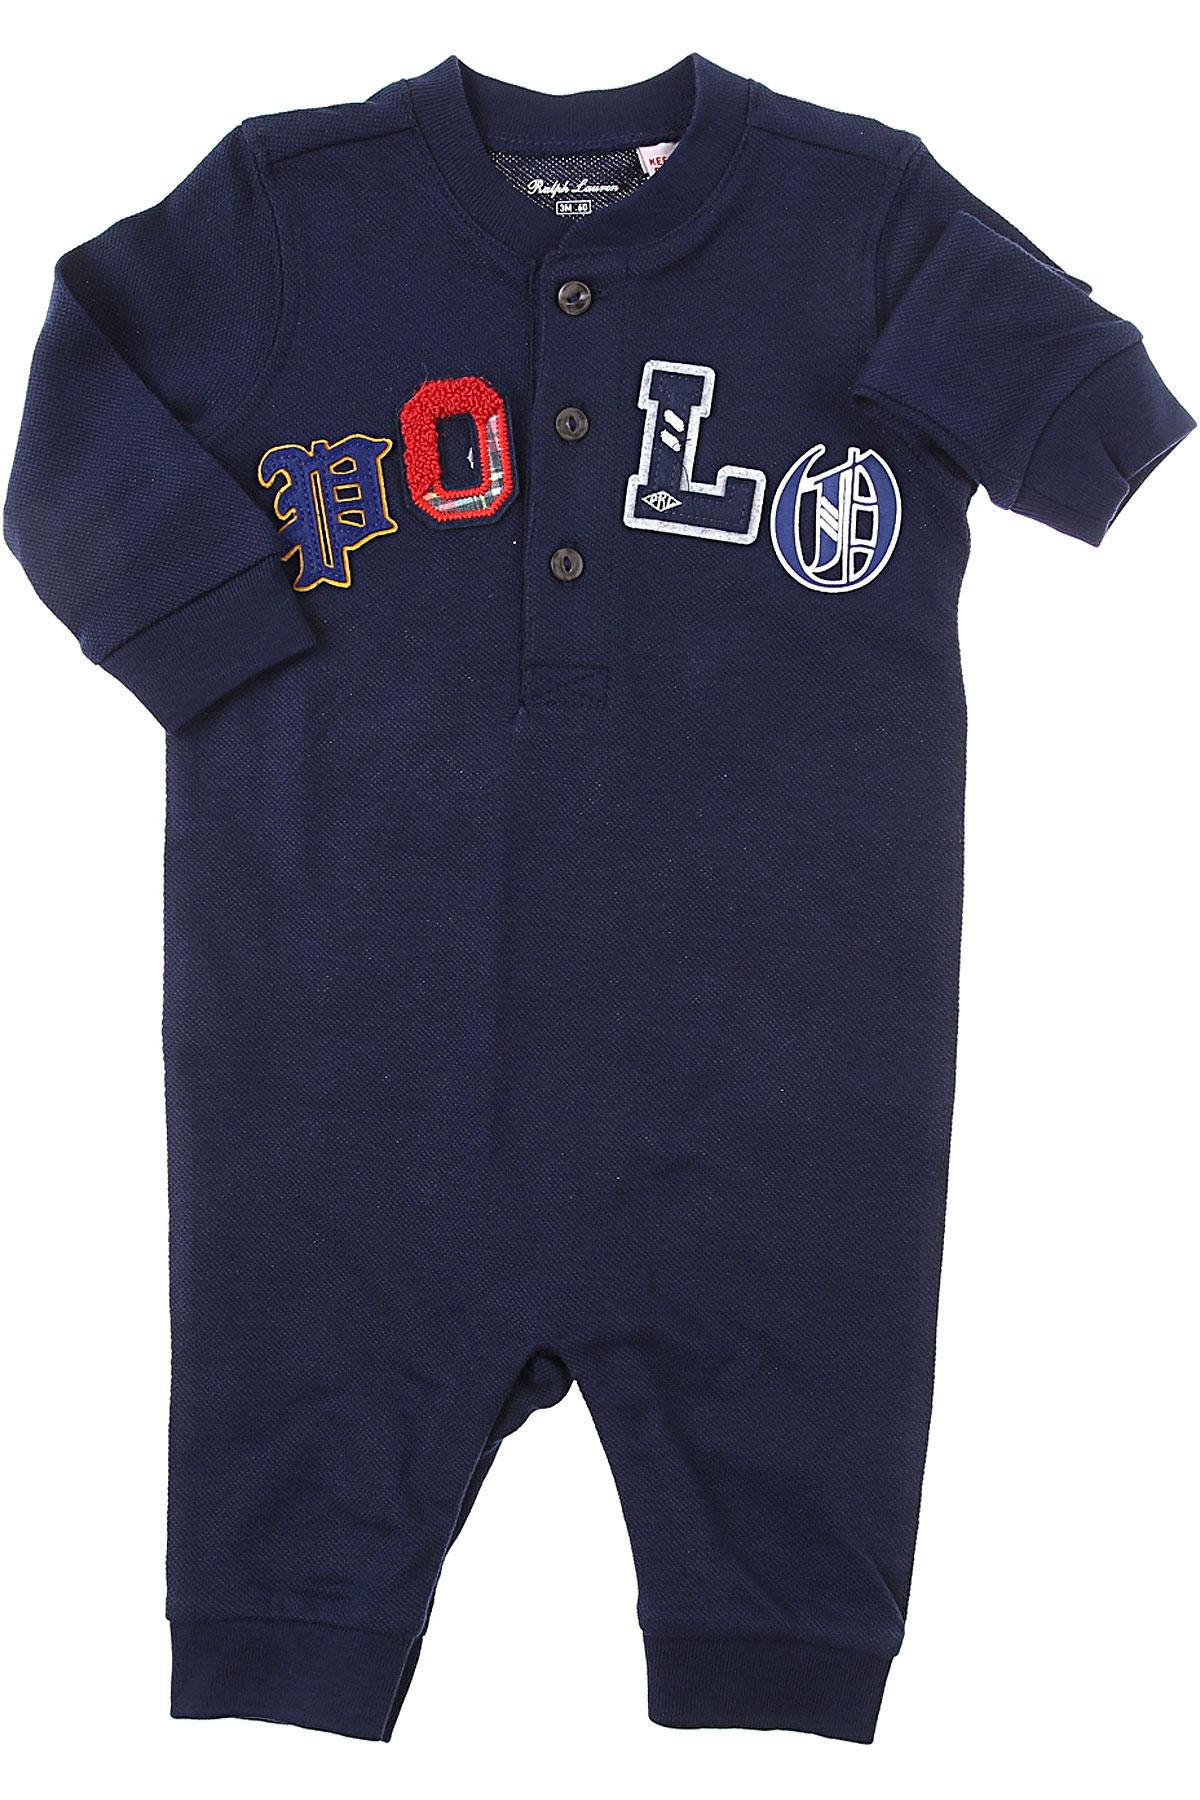 Ralph Lauren Baby Bodysuits & Onesies for Boys On Sale, Blue, Cotton, 2019, 3M 6M 9M